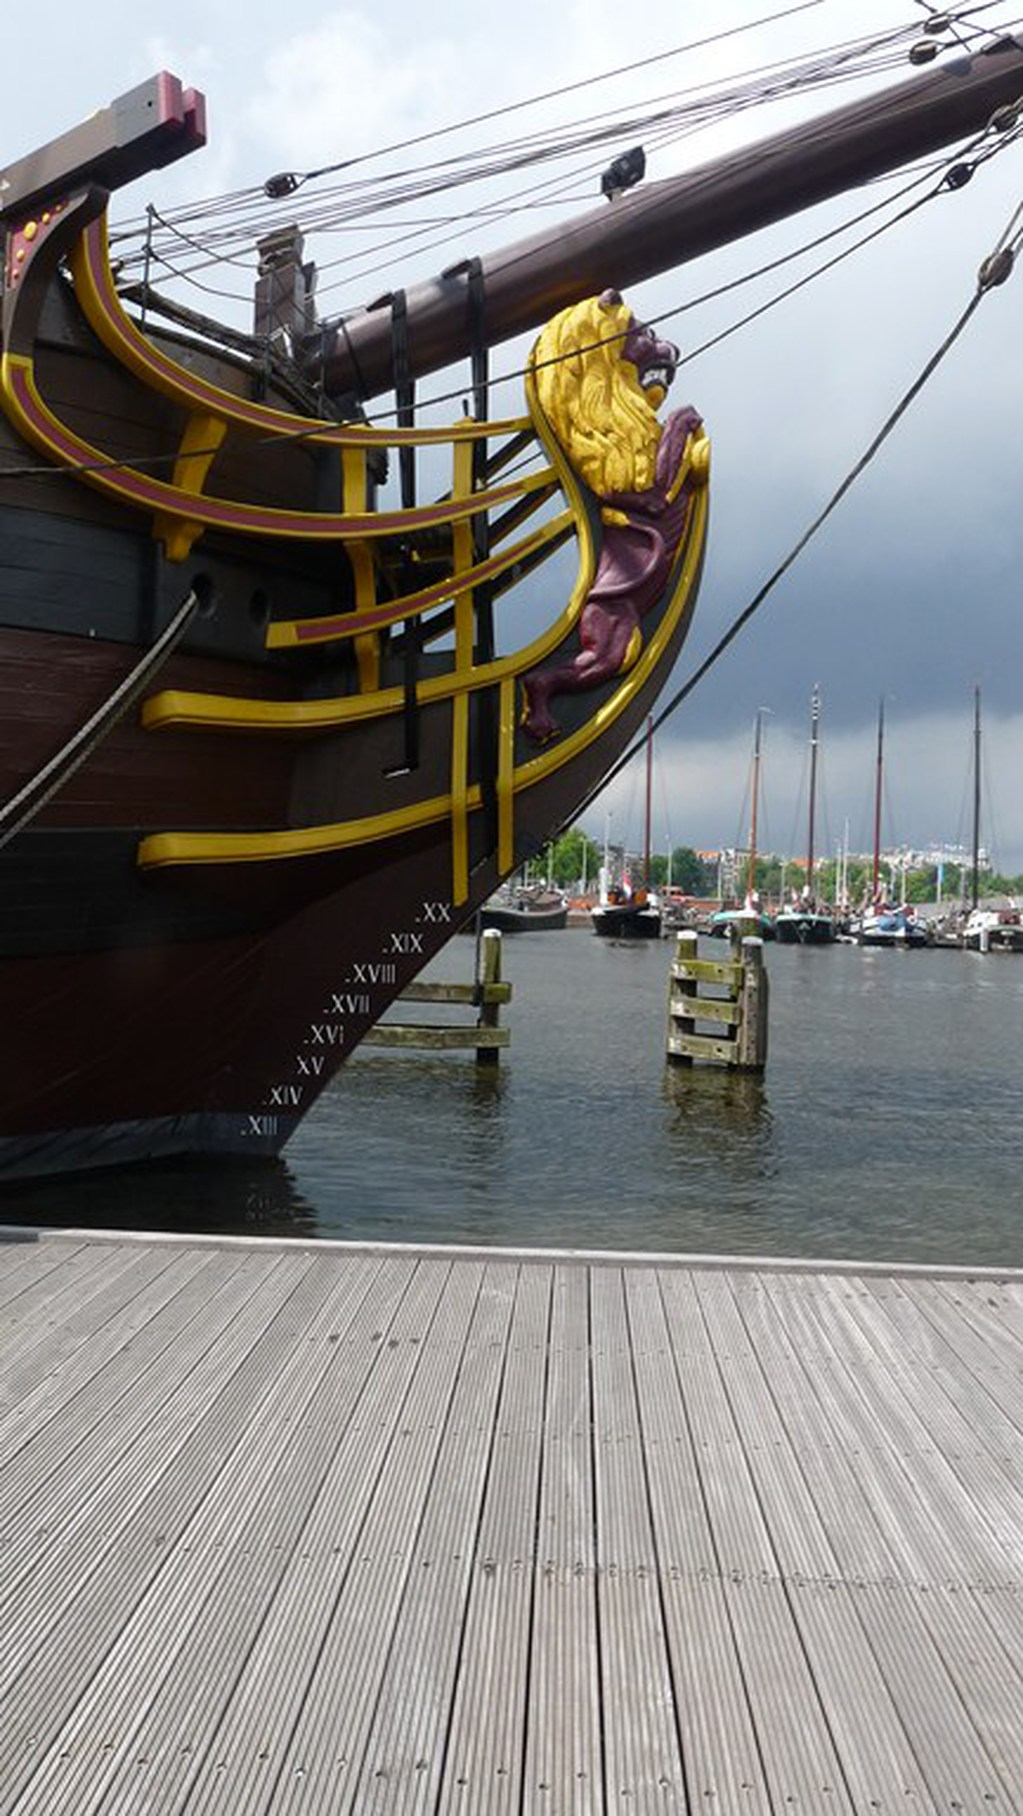 Visite du VOC « AMSTERDAM » (1749) à Amsterdam 17072807435023134915176661